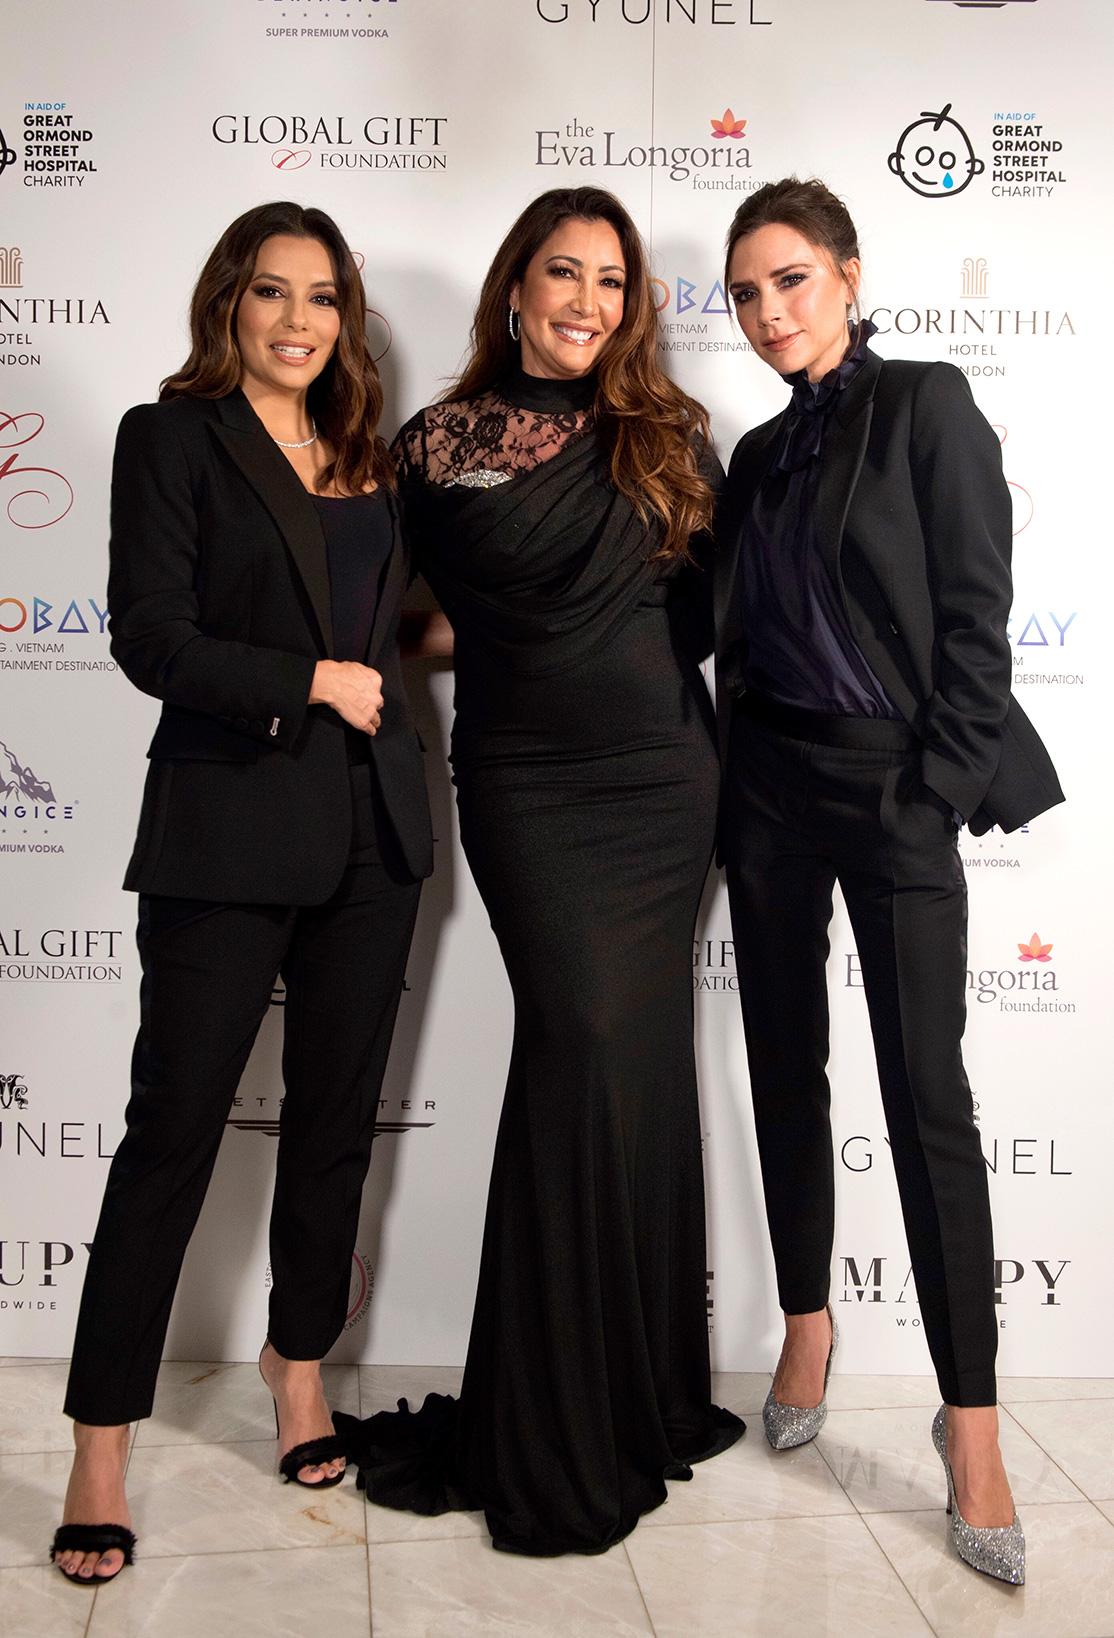 Global Gift Gala London 2017 - Eva Longoria, Maria Bravo, Victoria Beckham